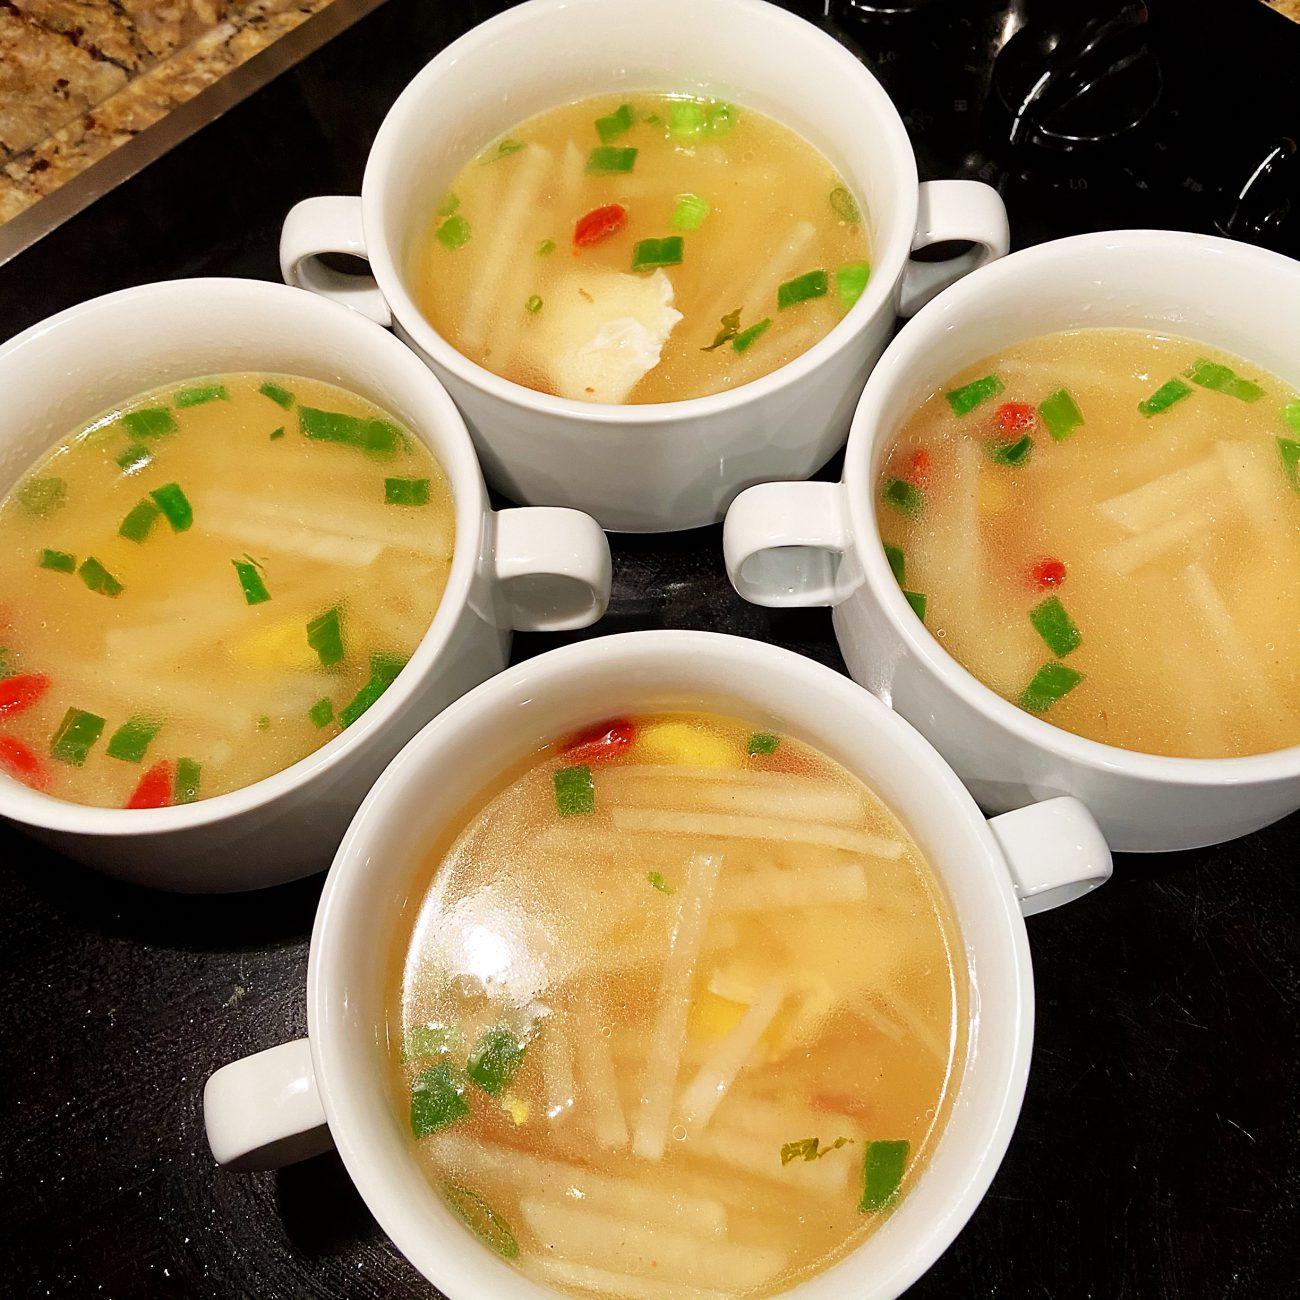 Radish (Daikon) Eggs Soup